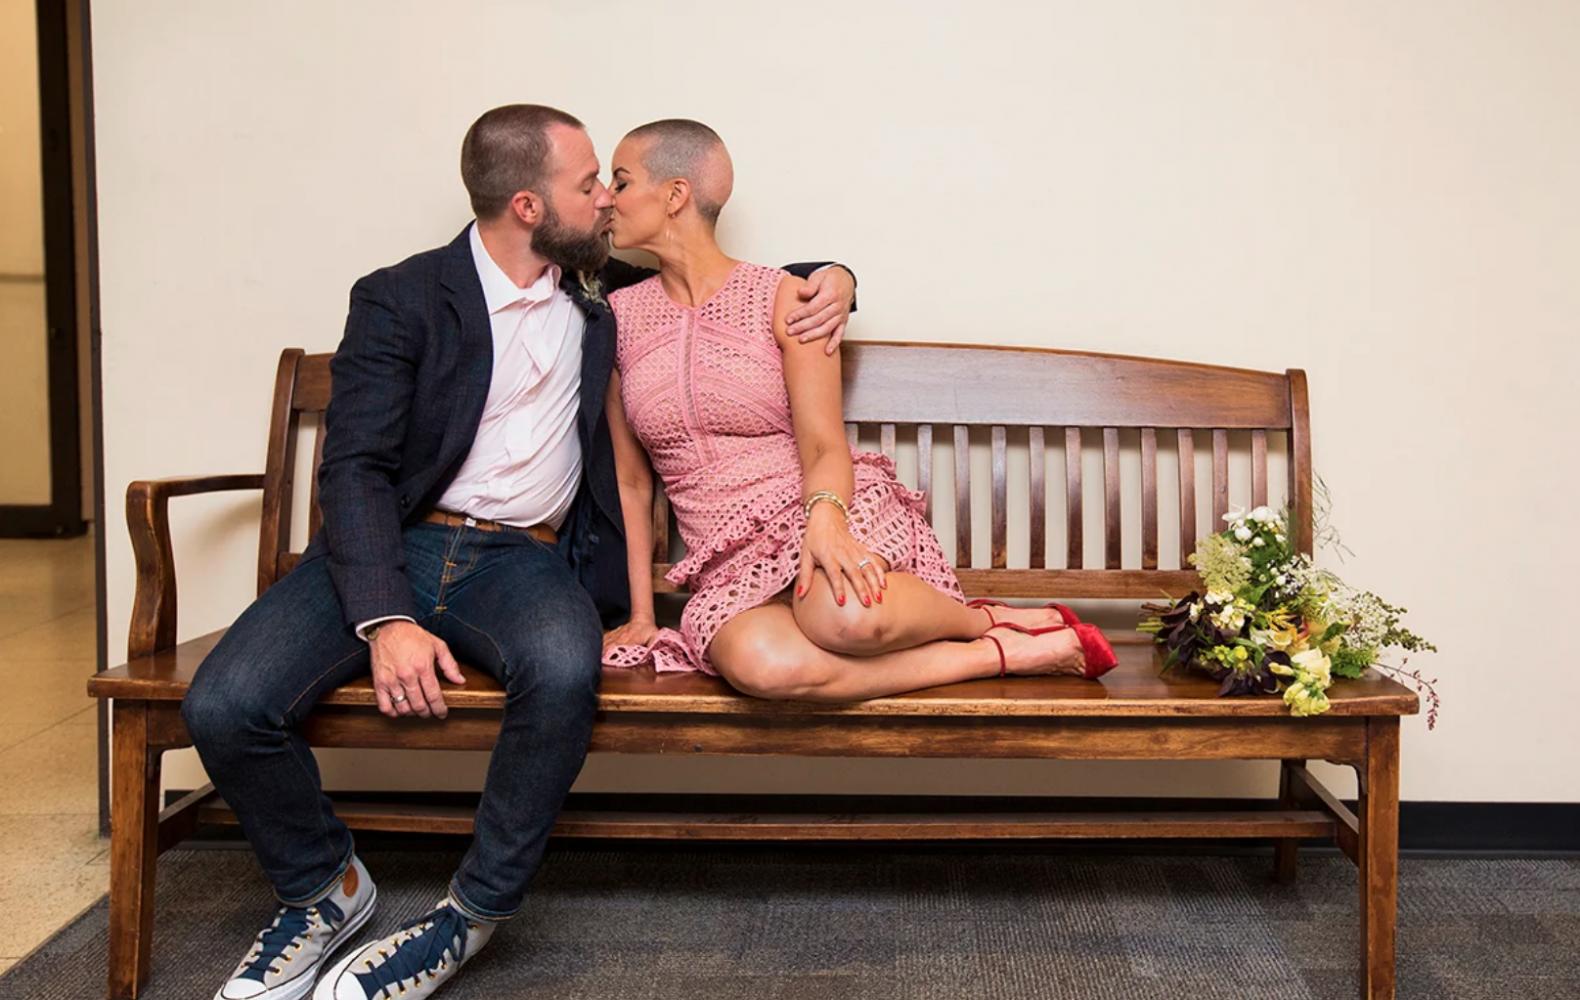 Katie  + Brogan | Chicago, Illinois | Cook County Marriage Court